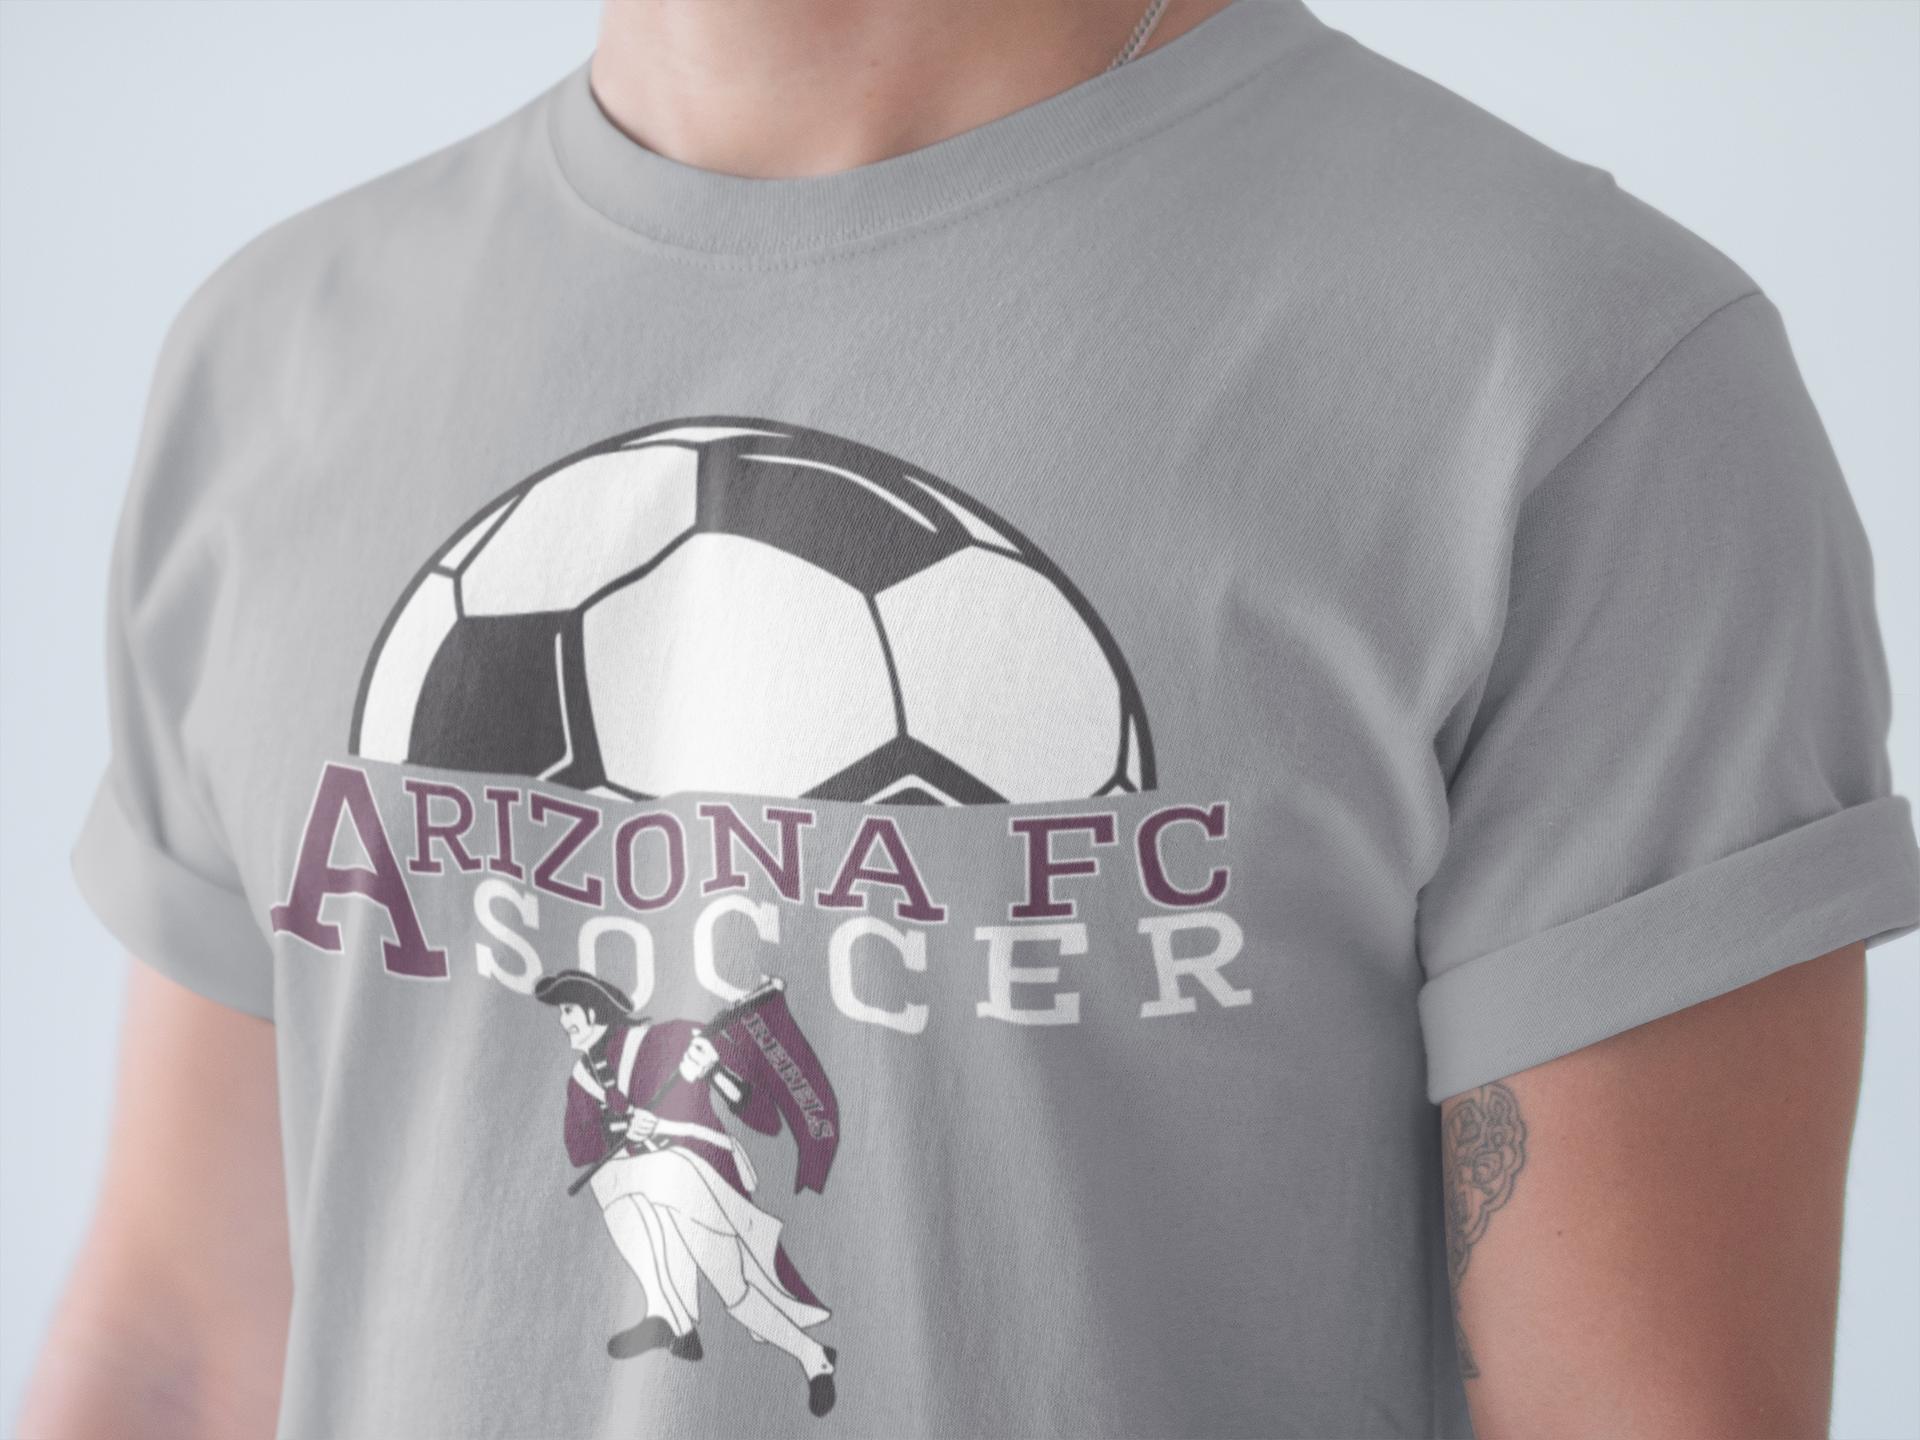 Arizona FC Soccer T-Shirt